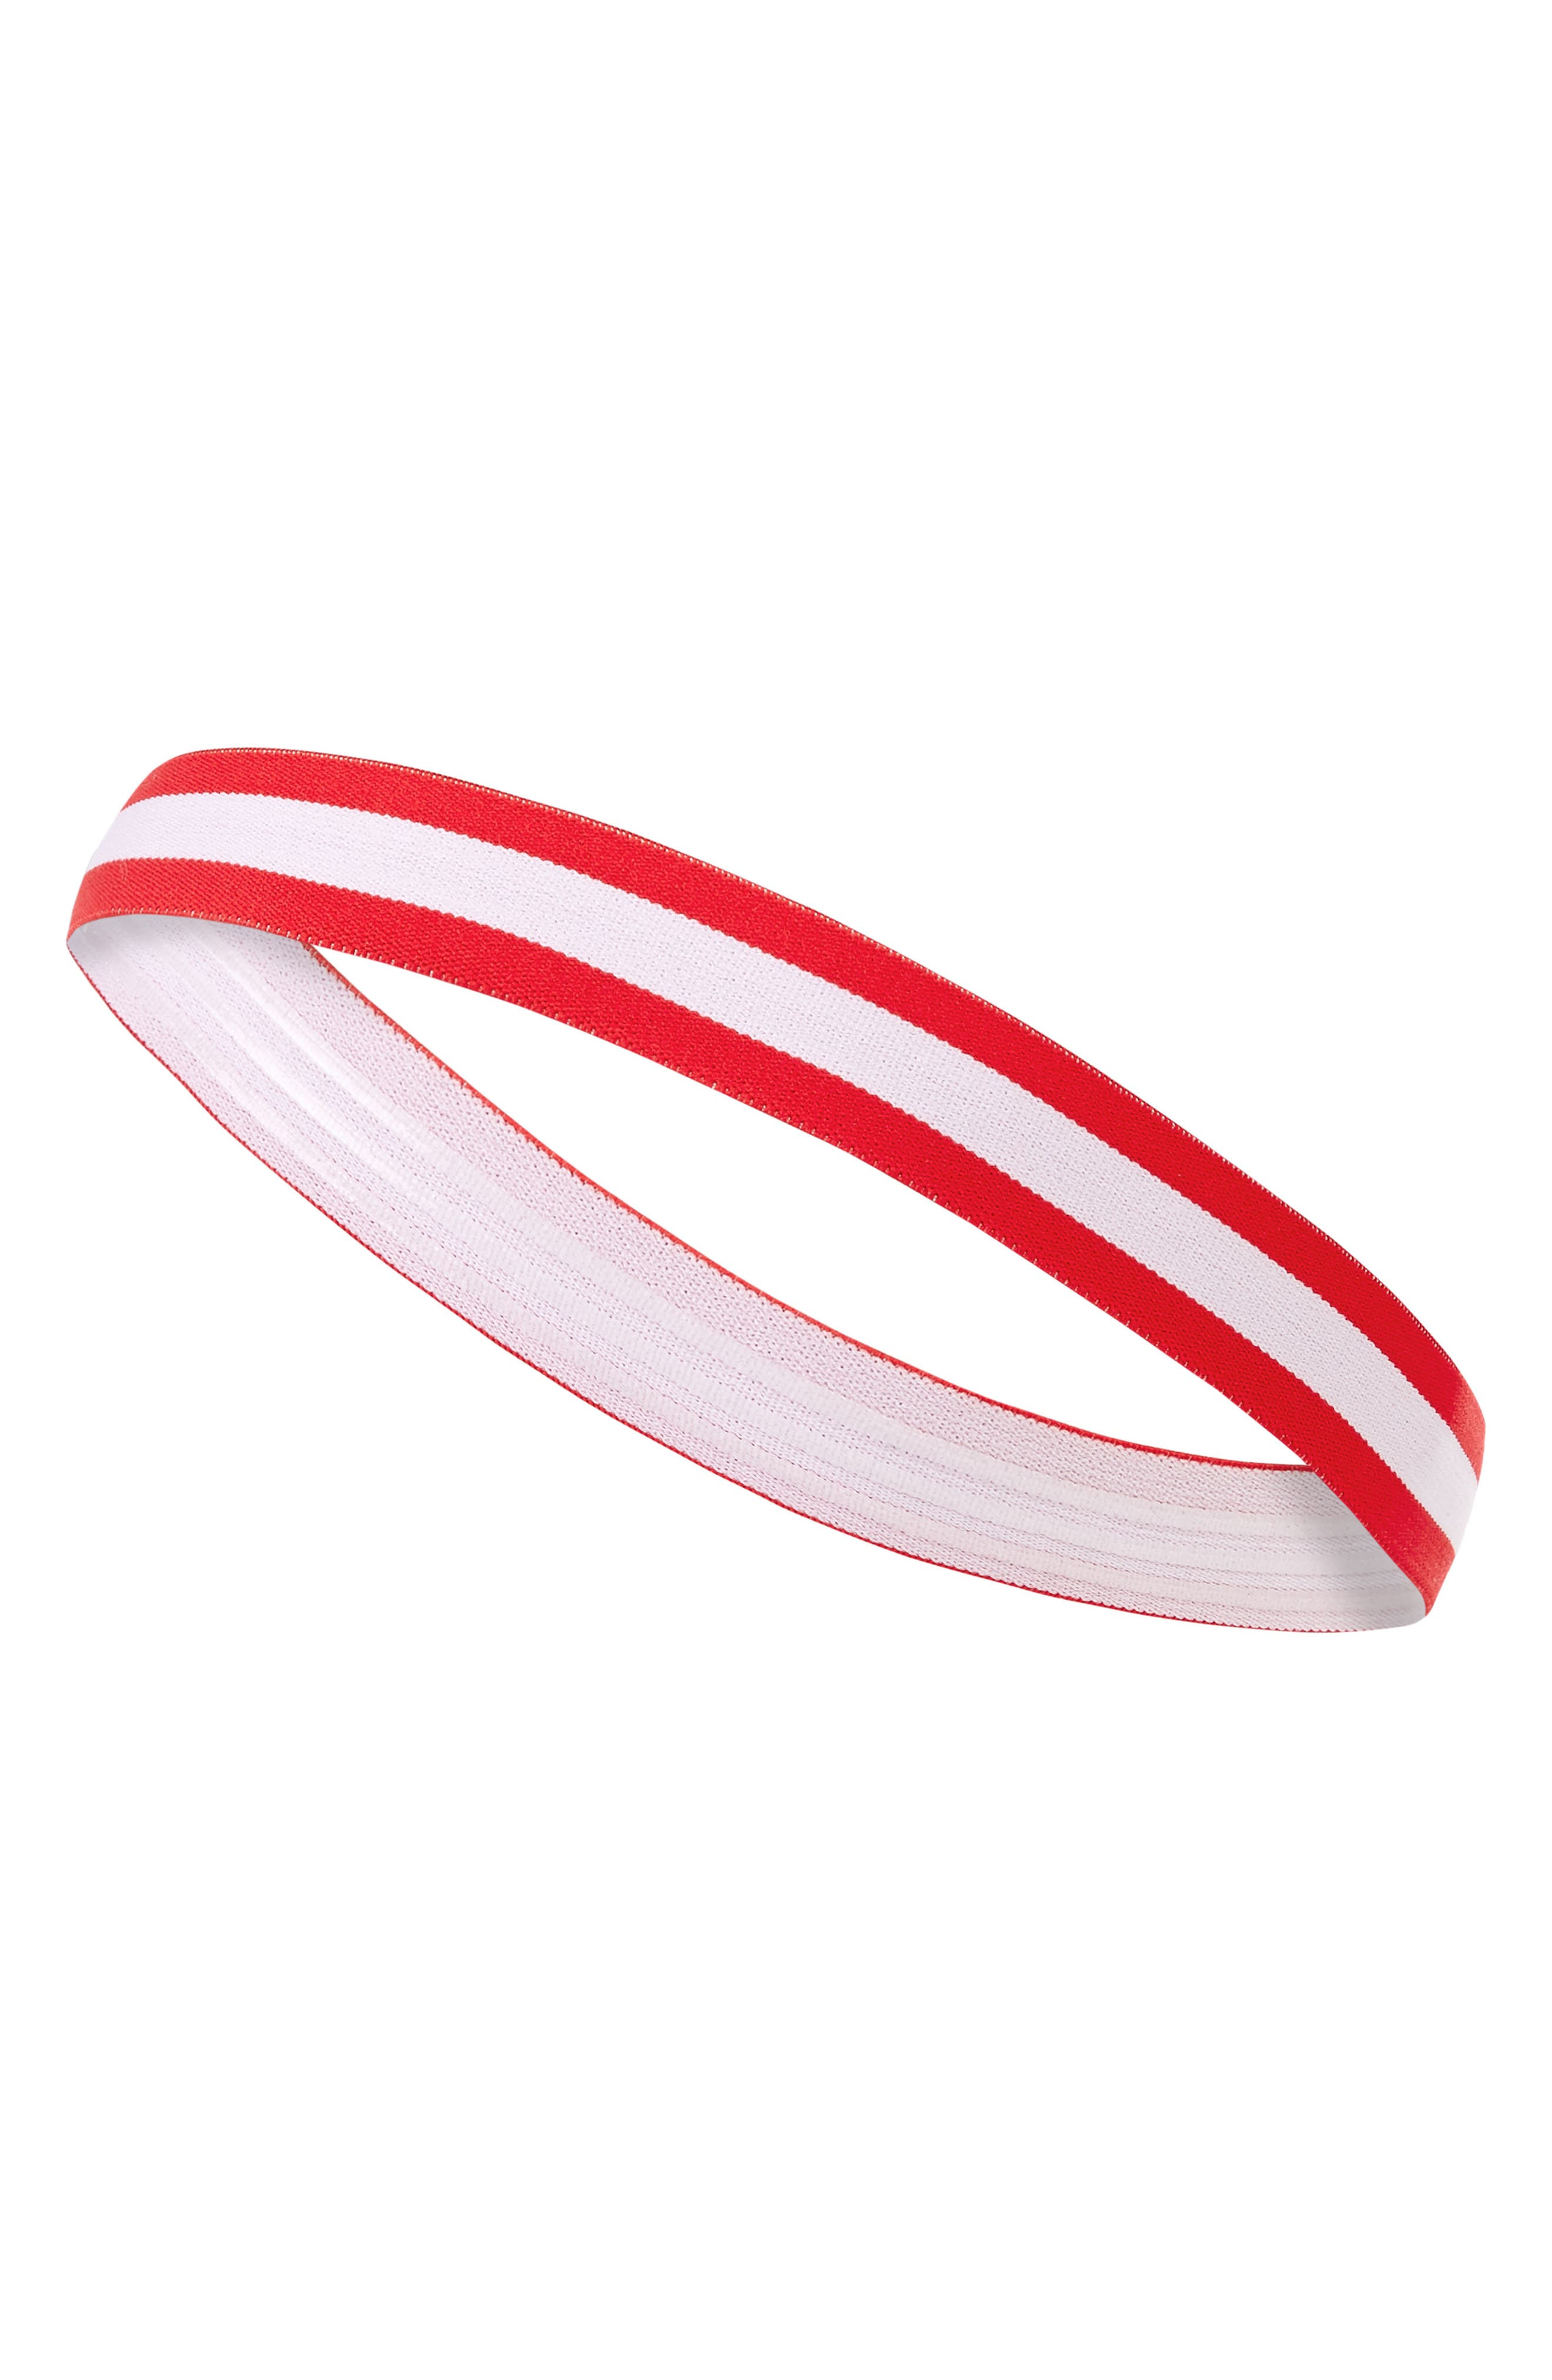 Medium Headband,                         Main,                         color, Red/ White